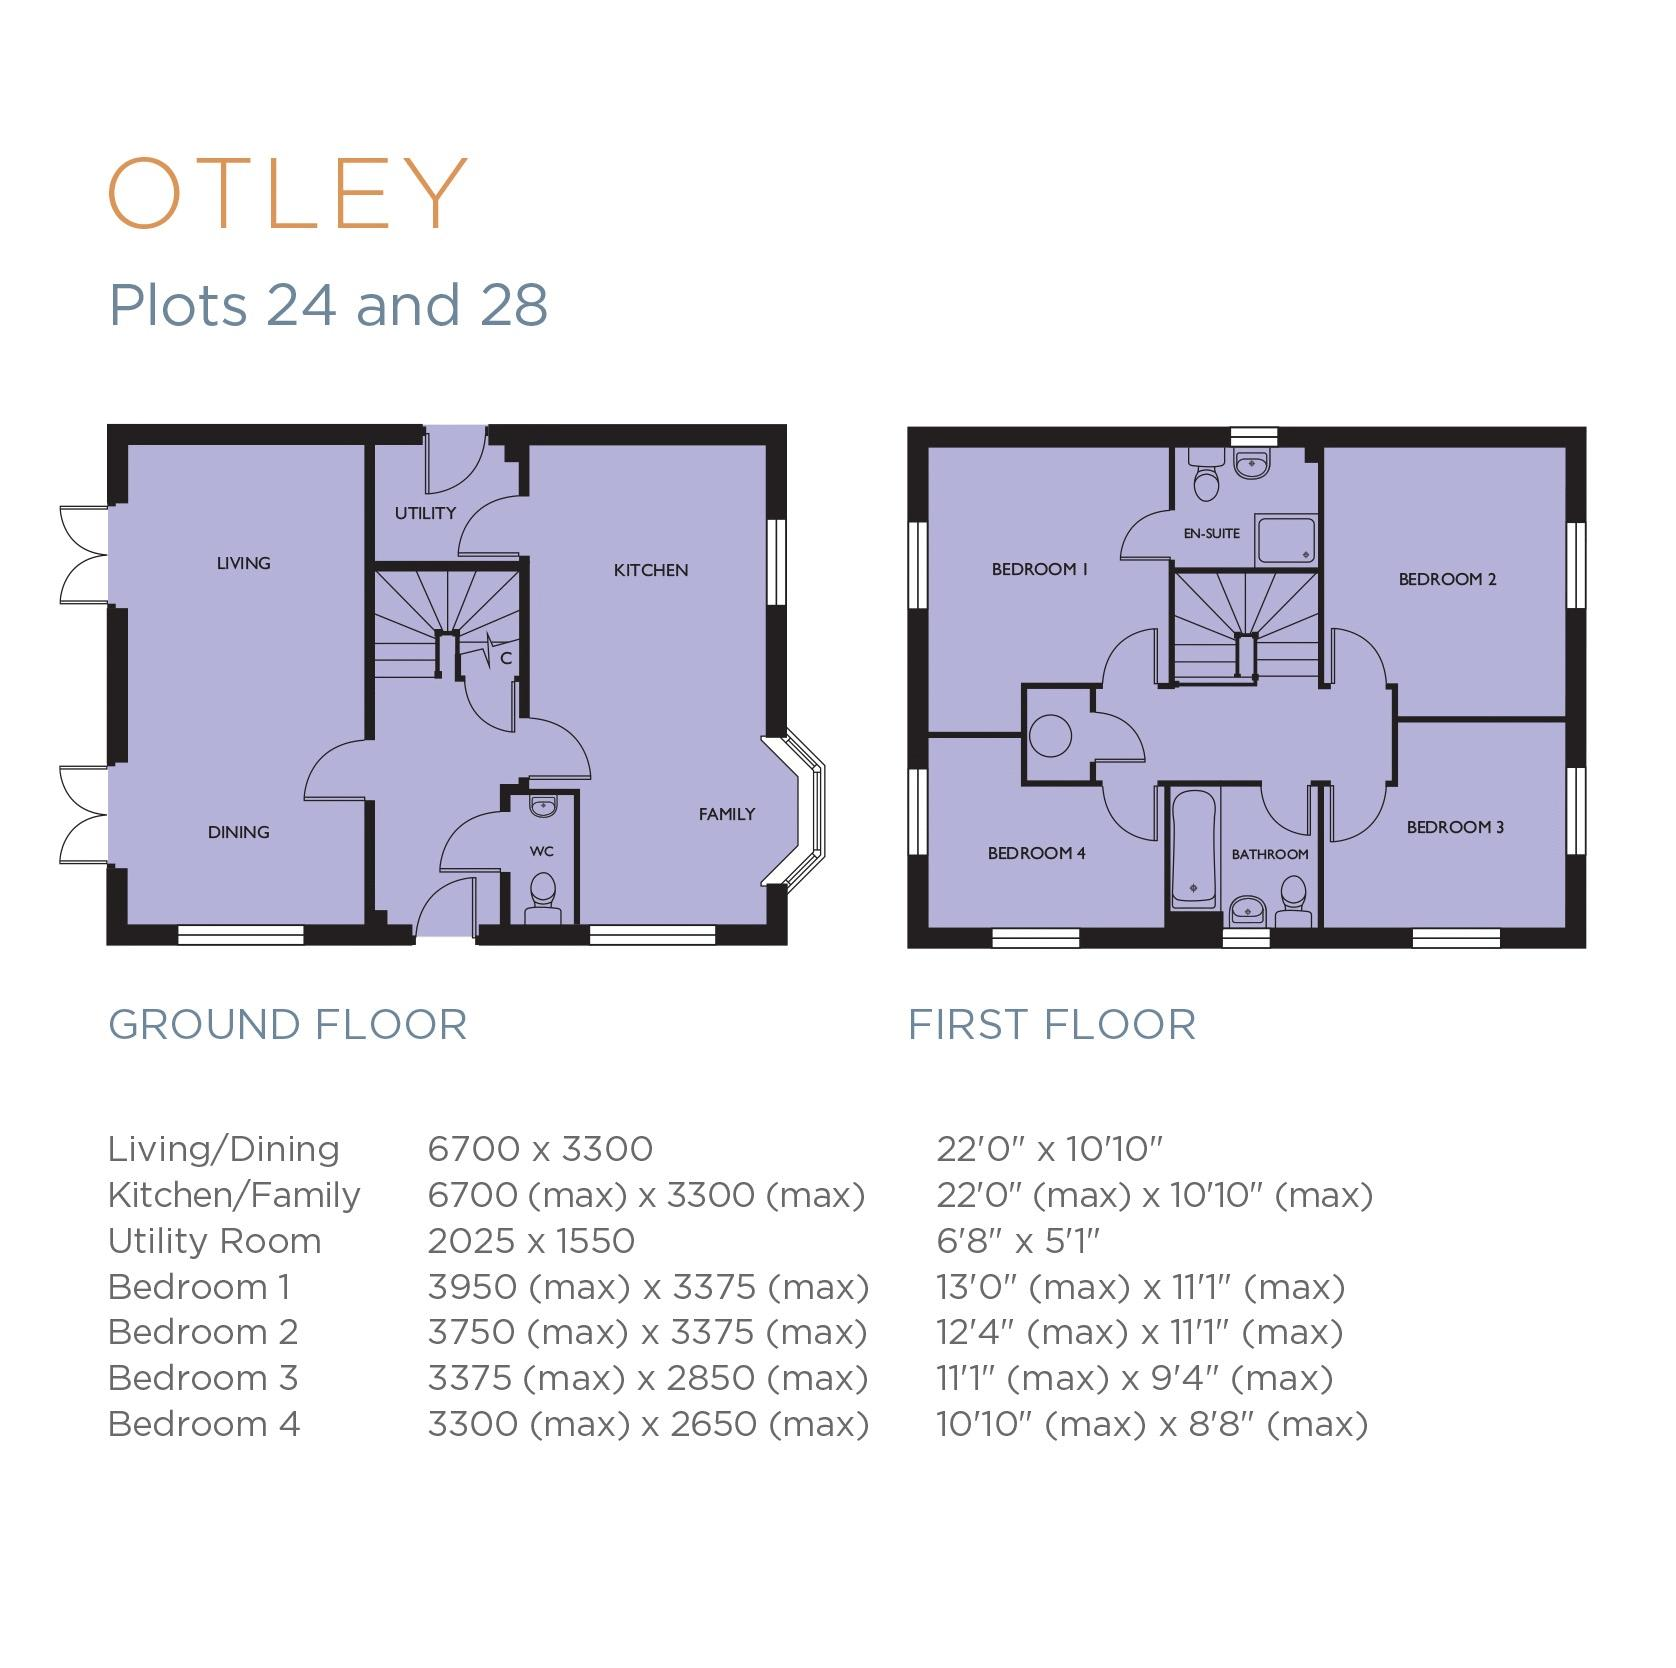 Otley Floorplan